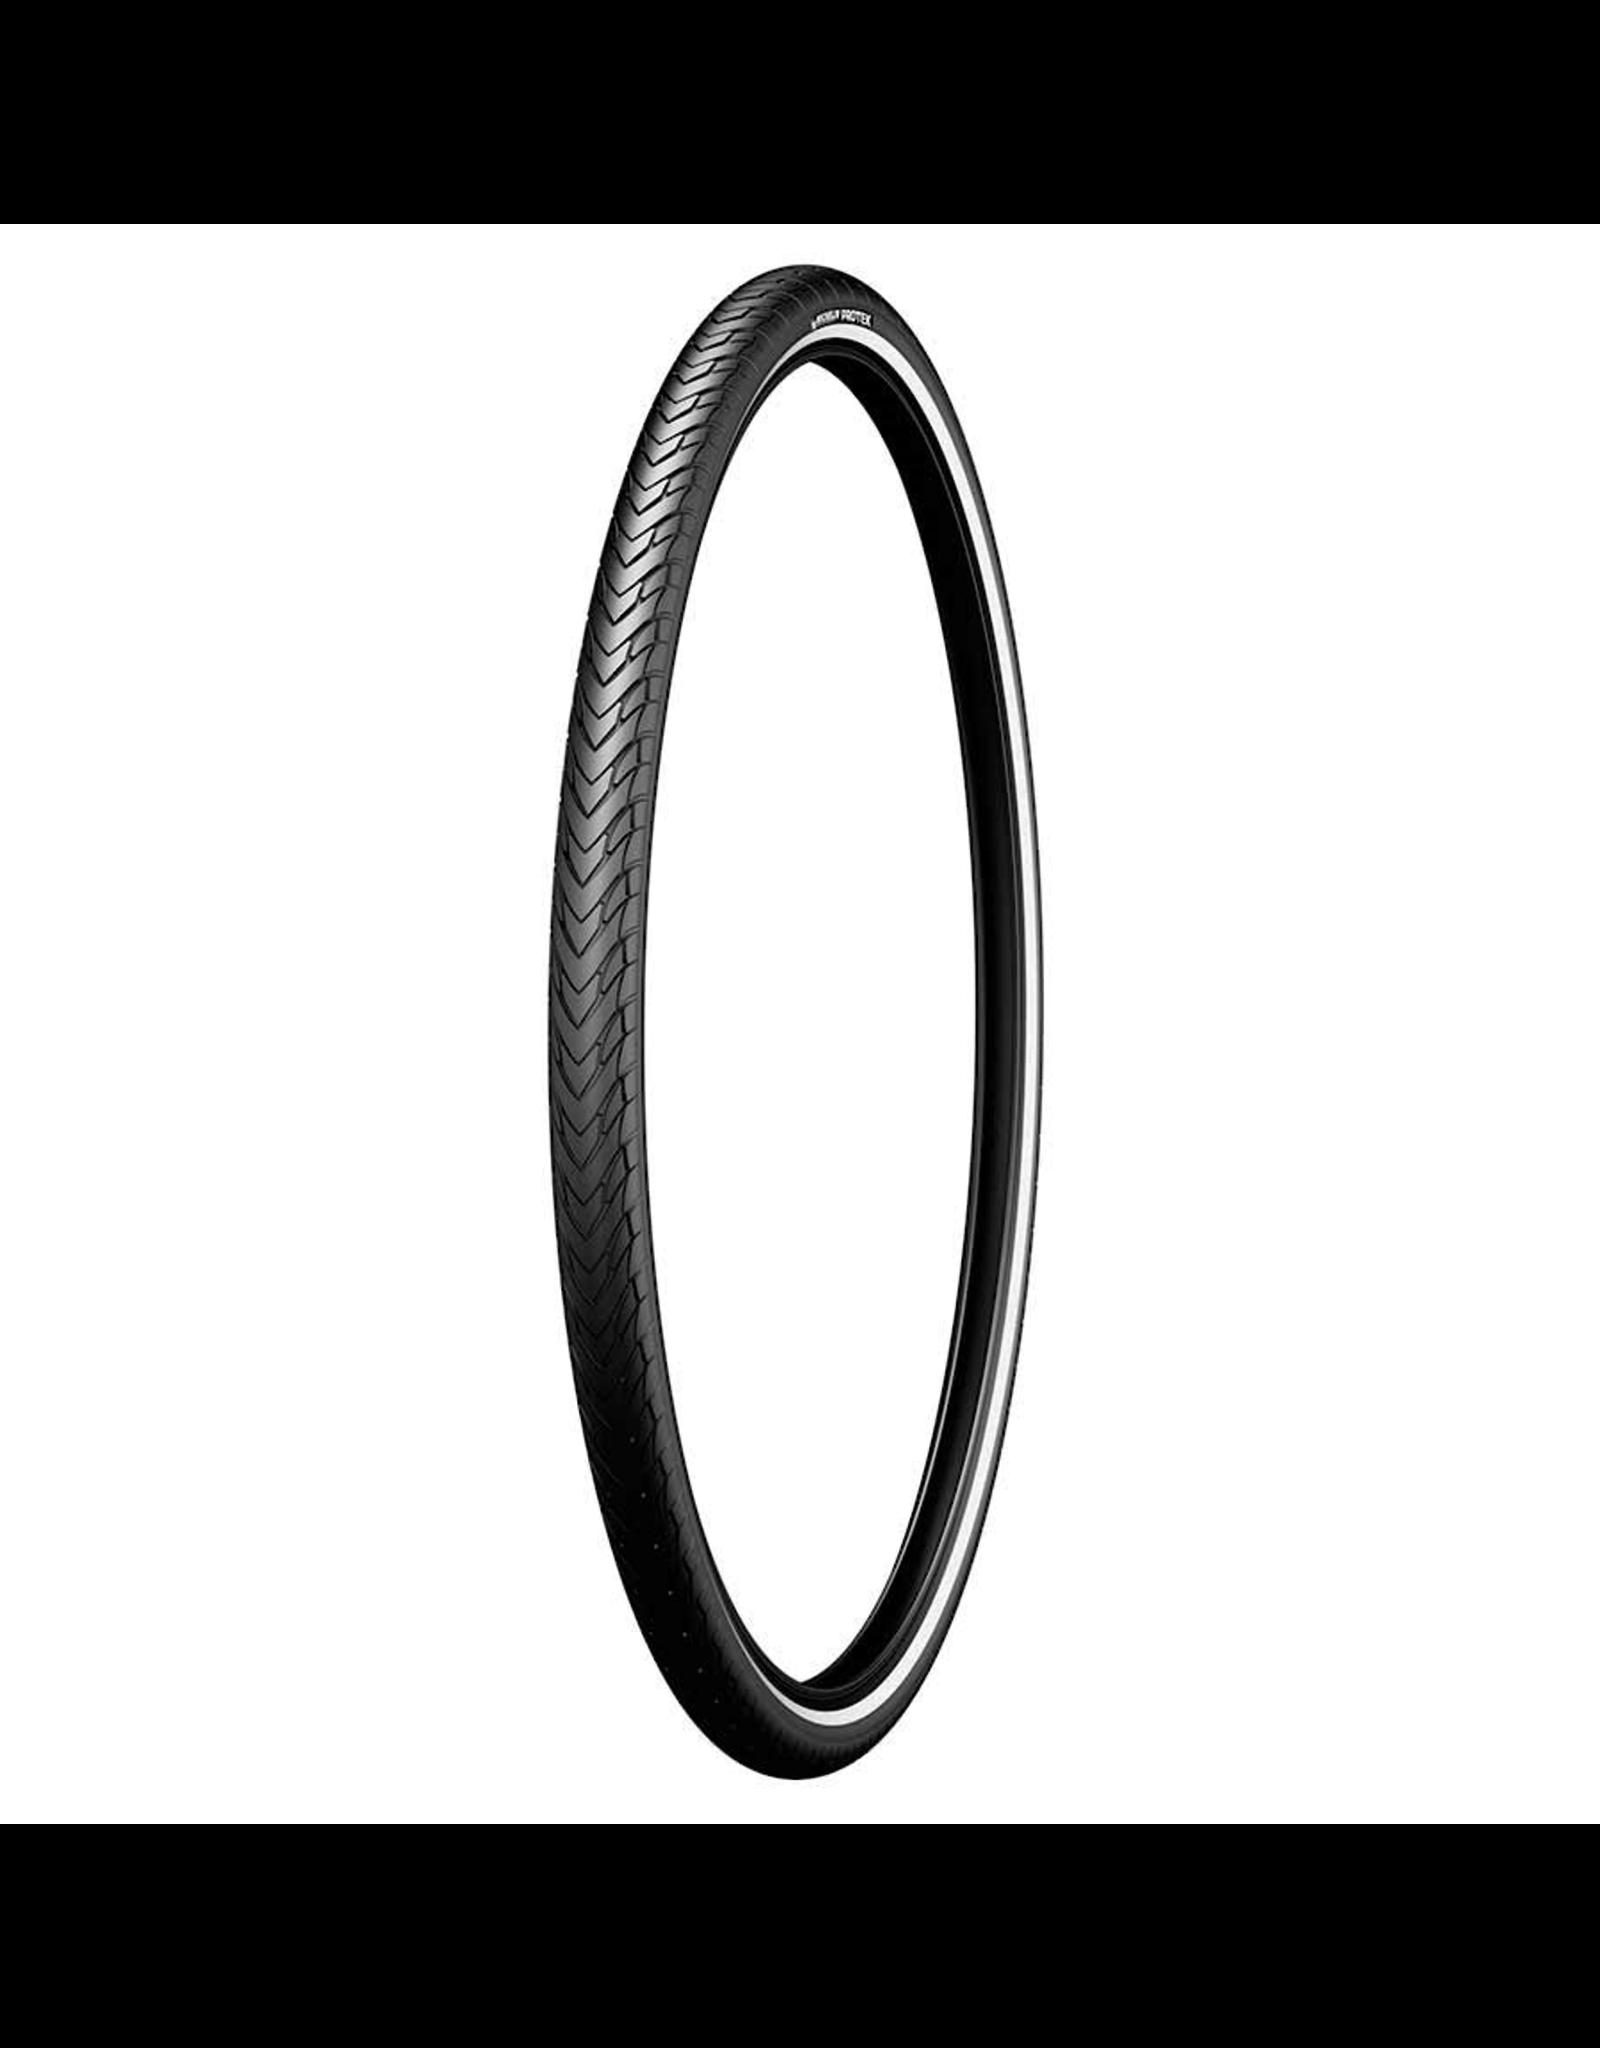 Michelin Protek tire, 26''x1.85, Rigide, Tringle, Protek 1mm, Reflex, 22TPI, blk